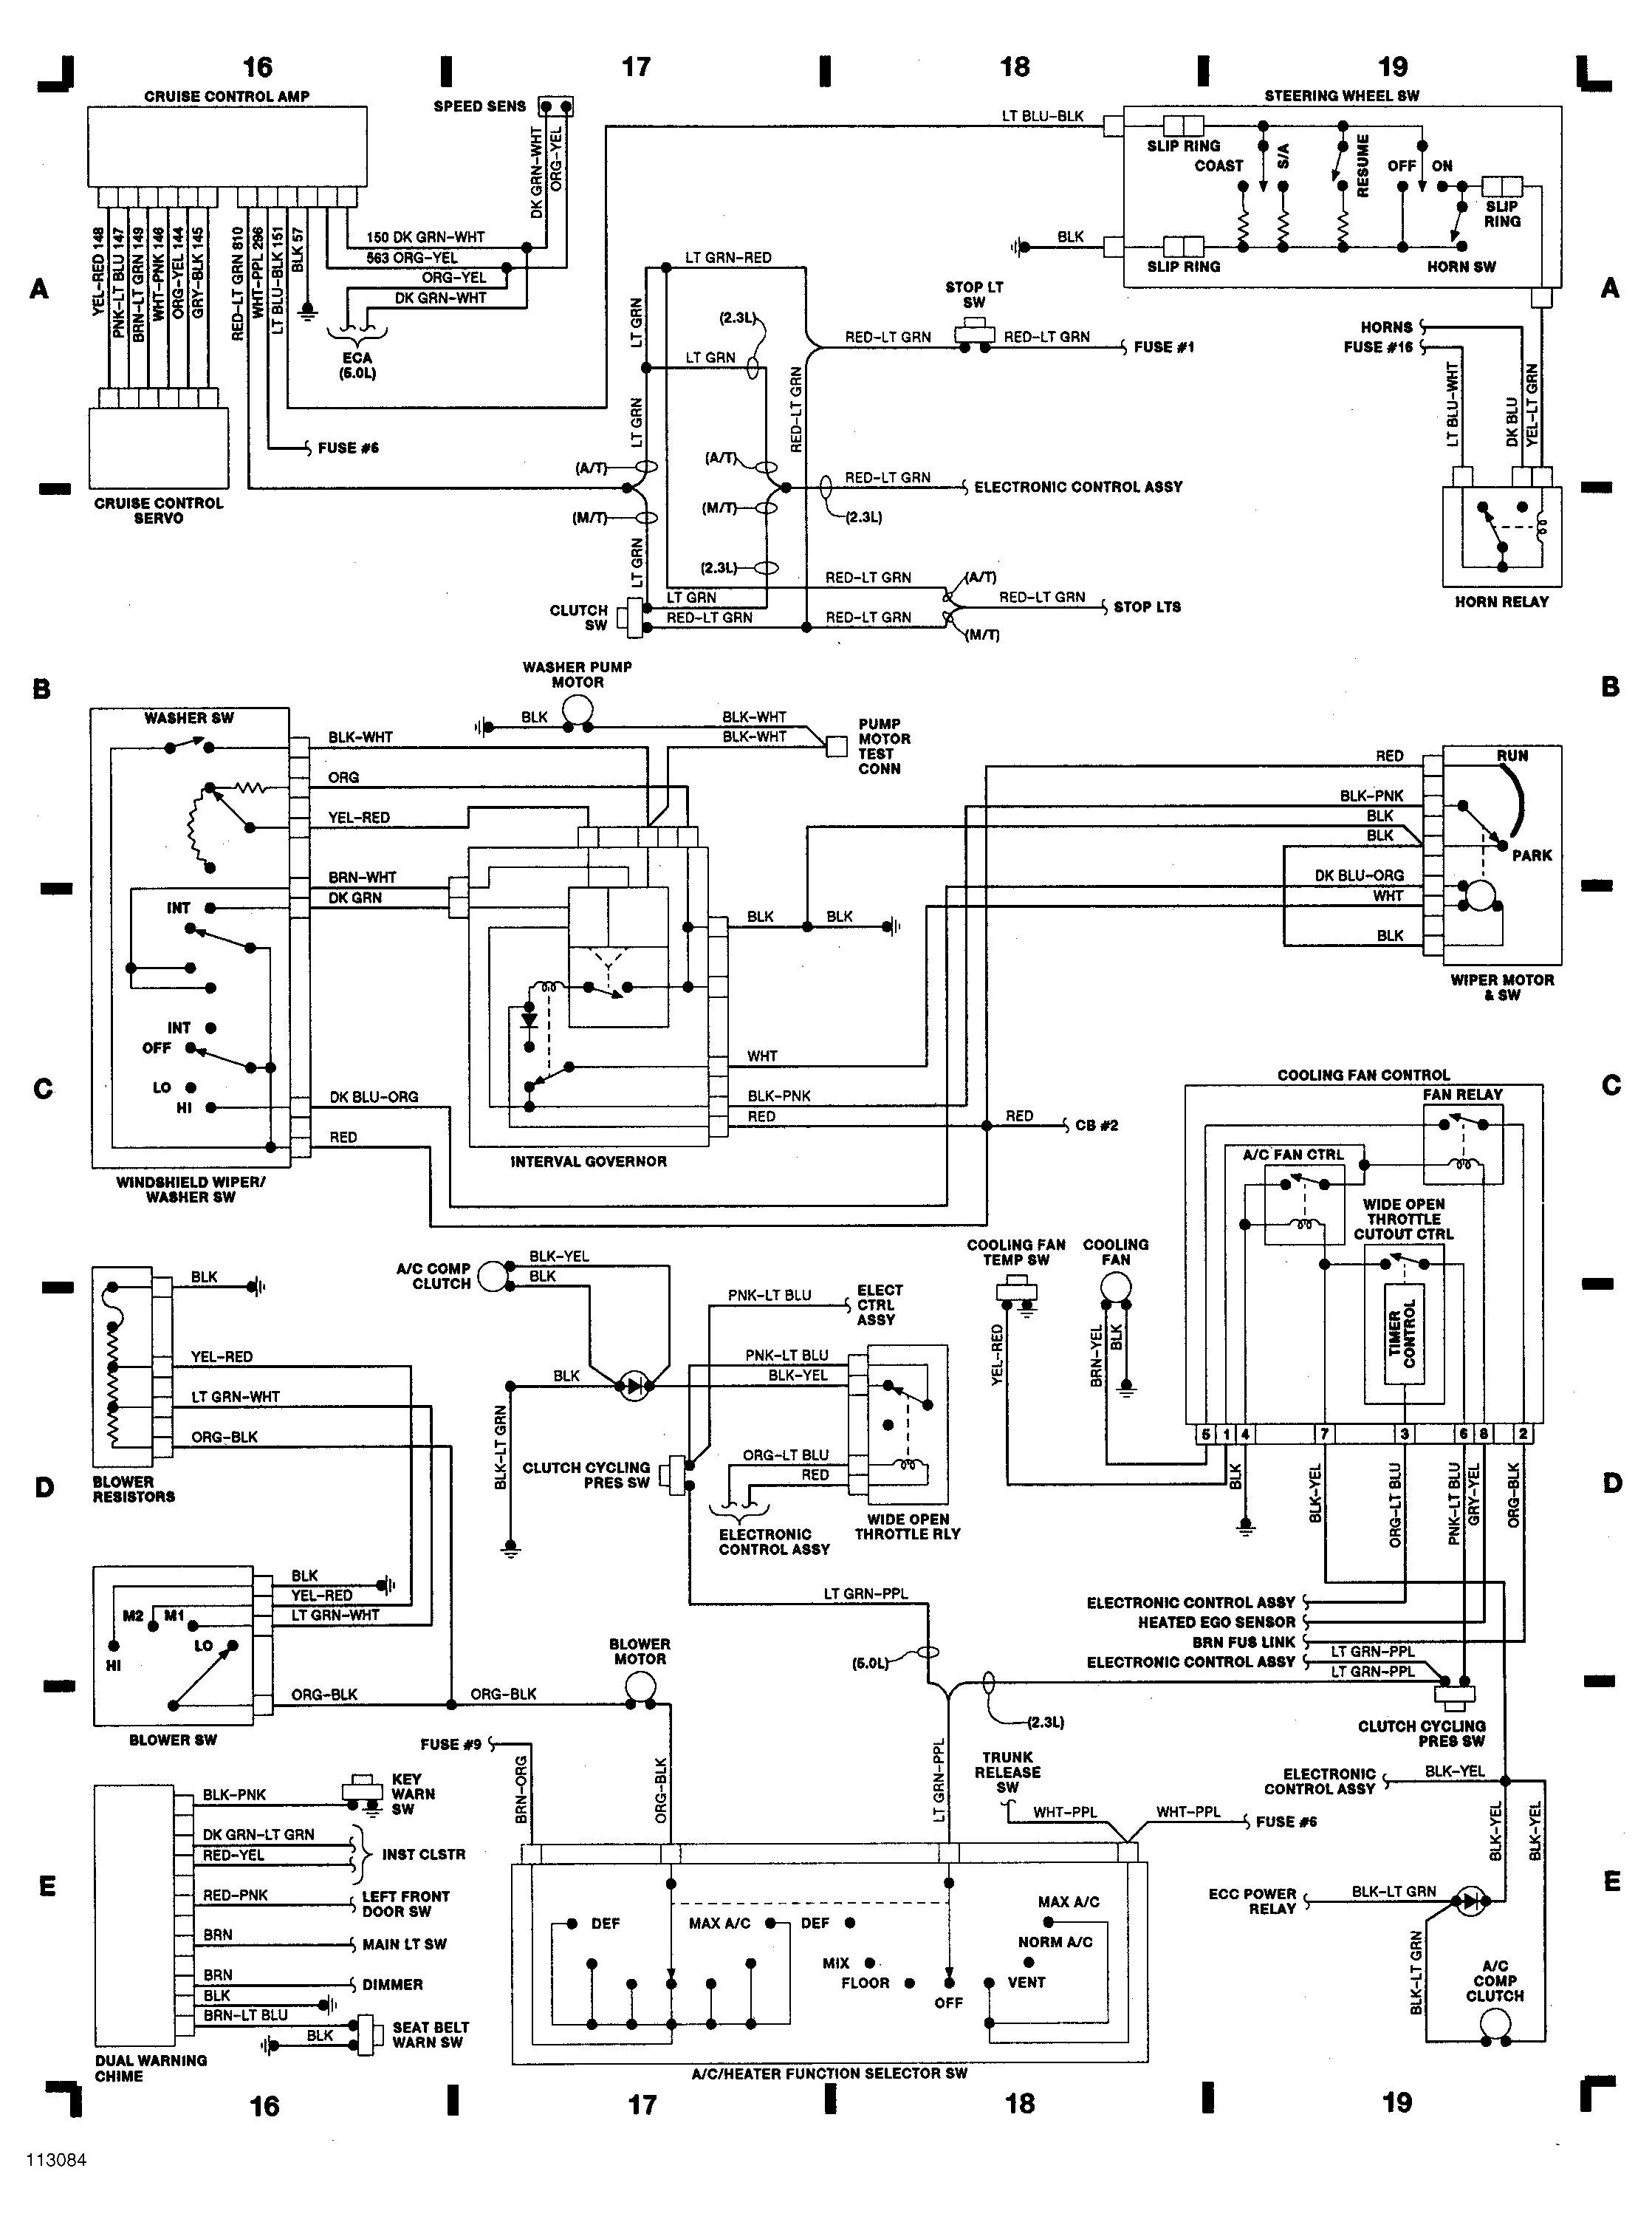 [DIAGRAM] 2003 Ford Mustang Gt Body Wiring Diagram FULL